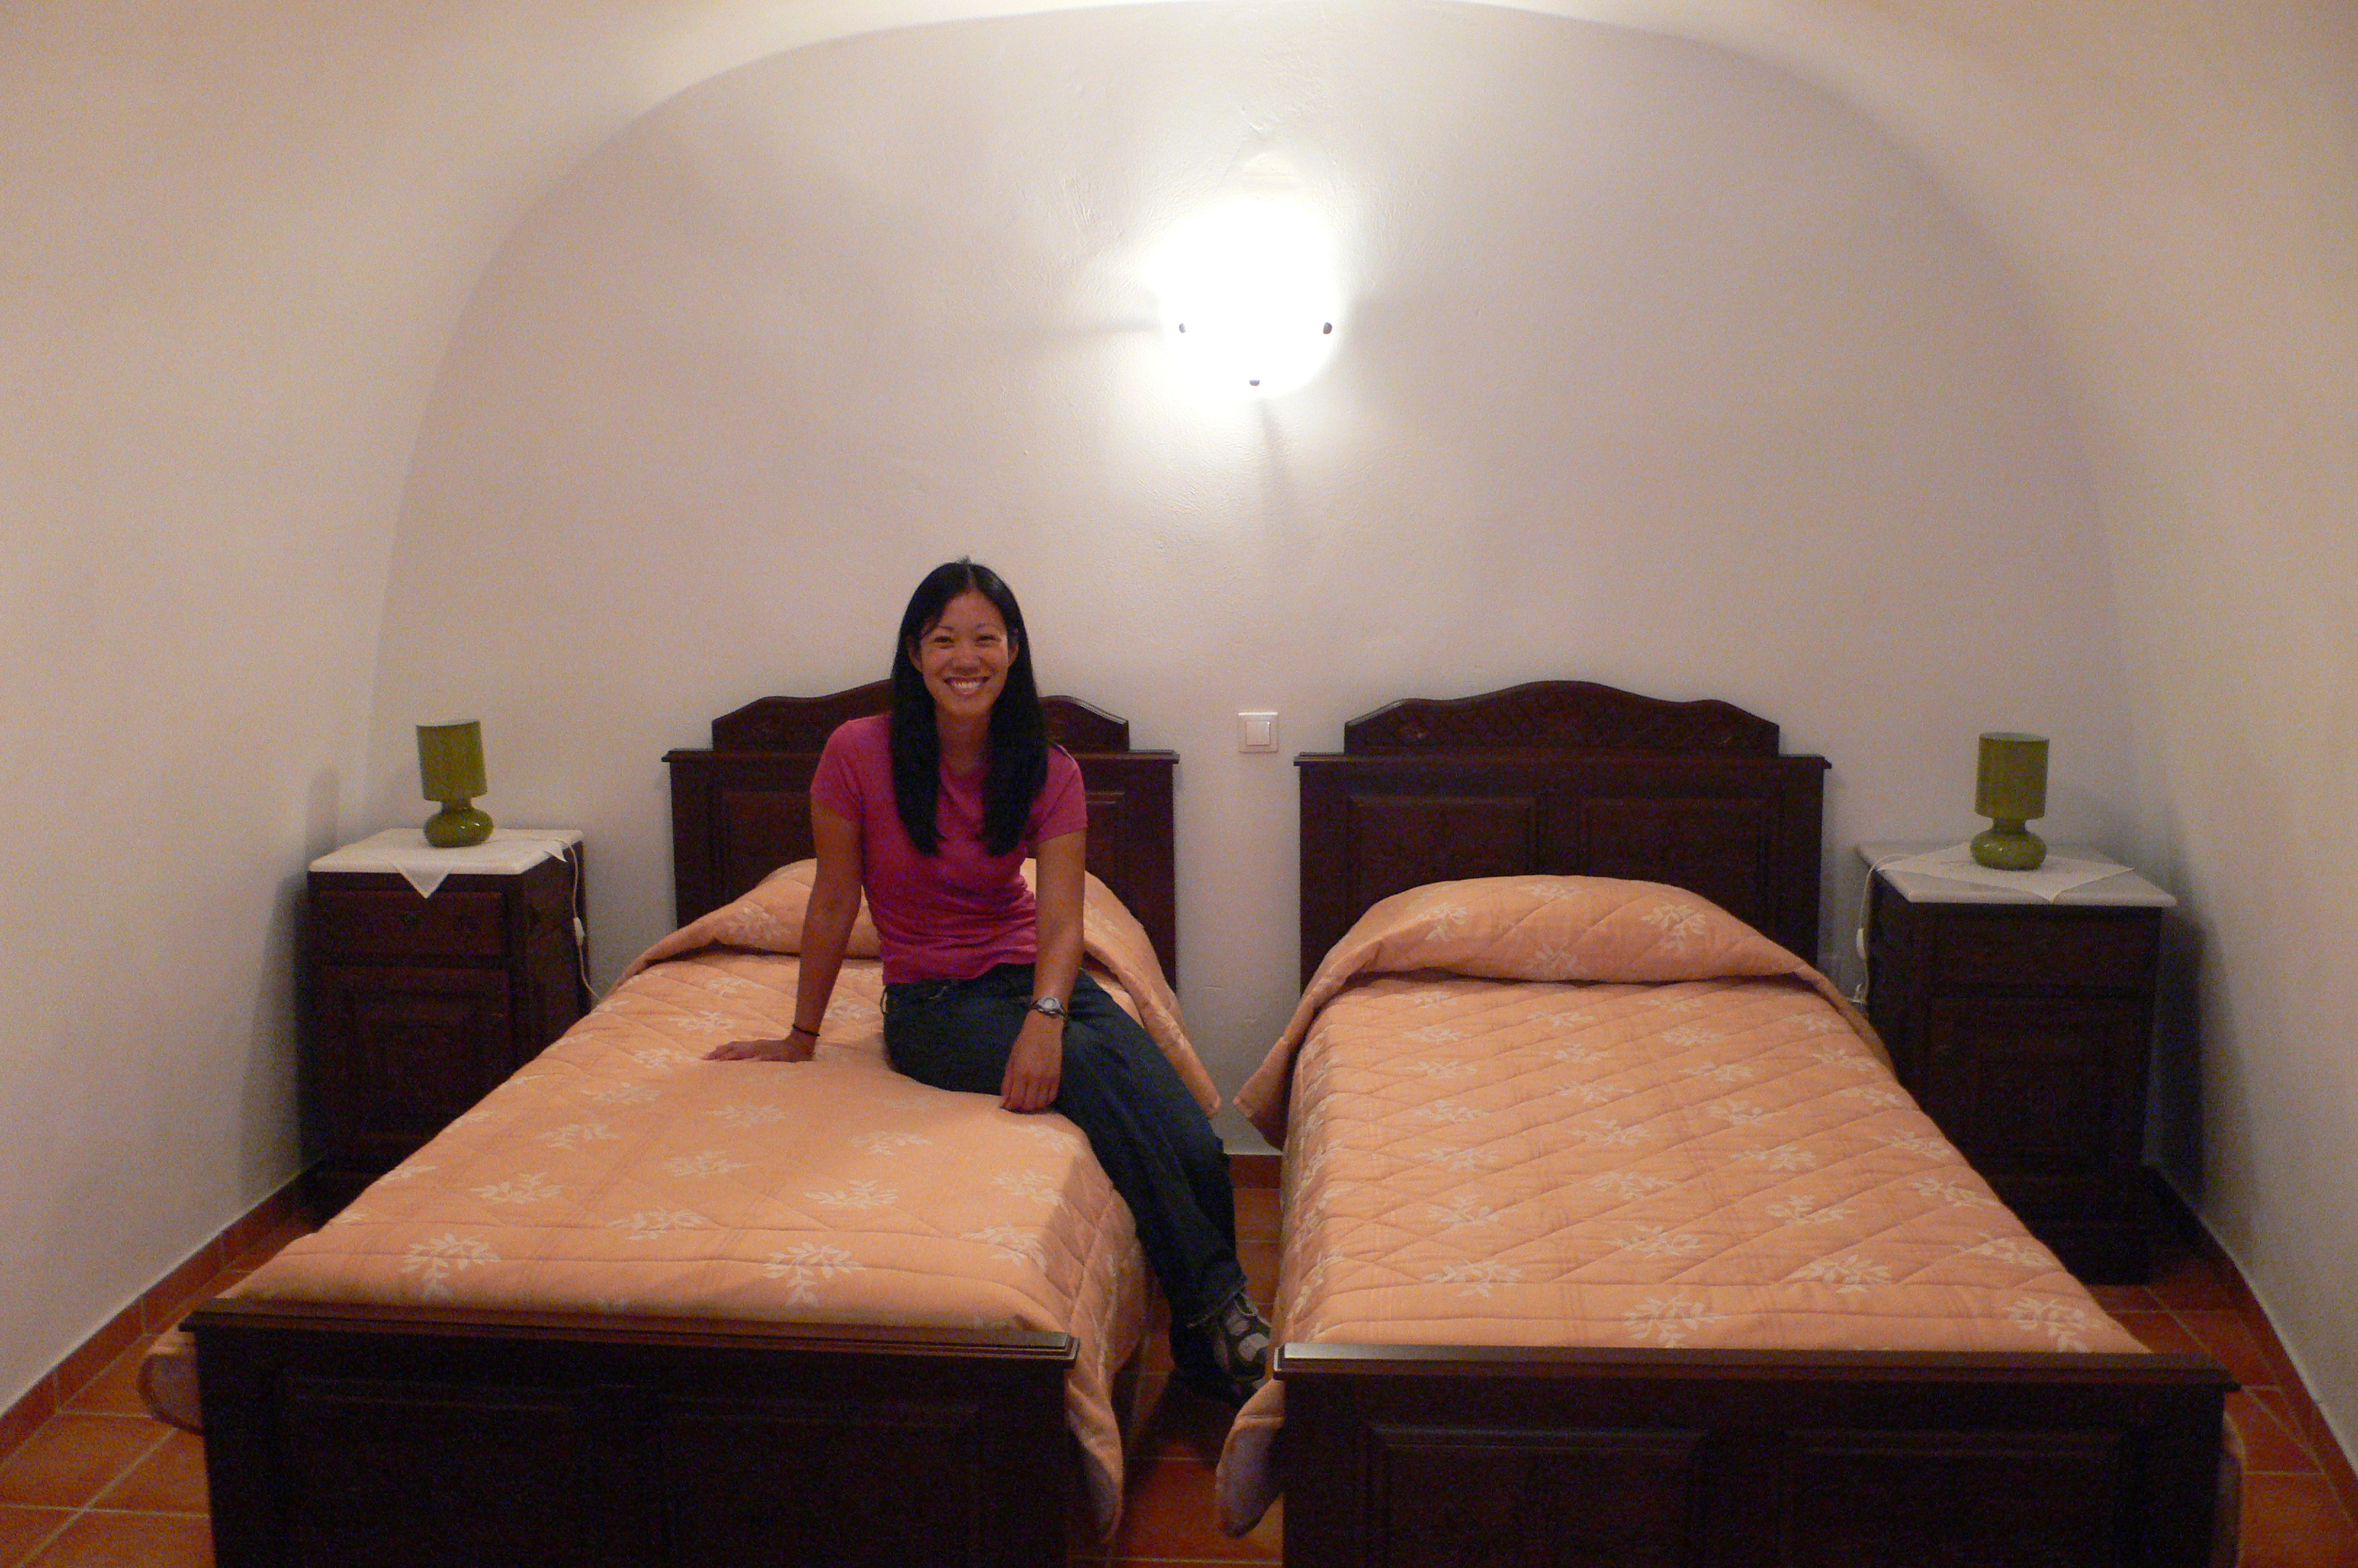 steph's bedroom